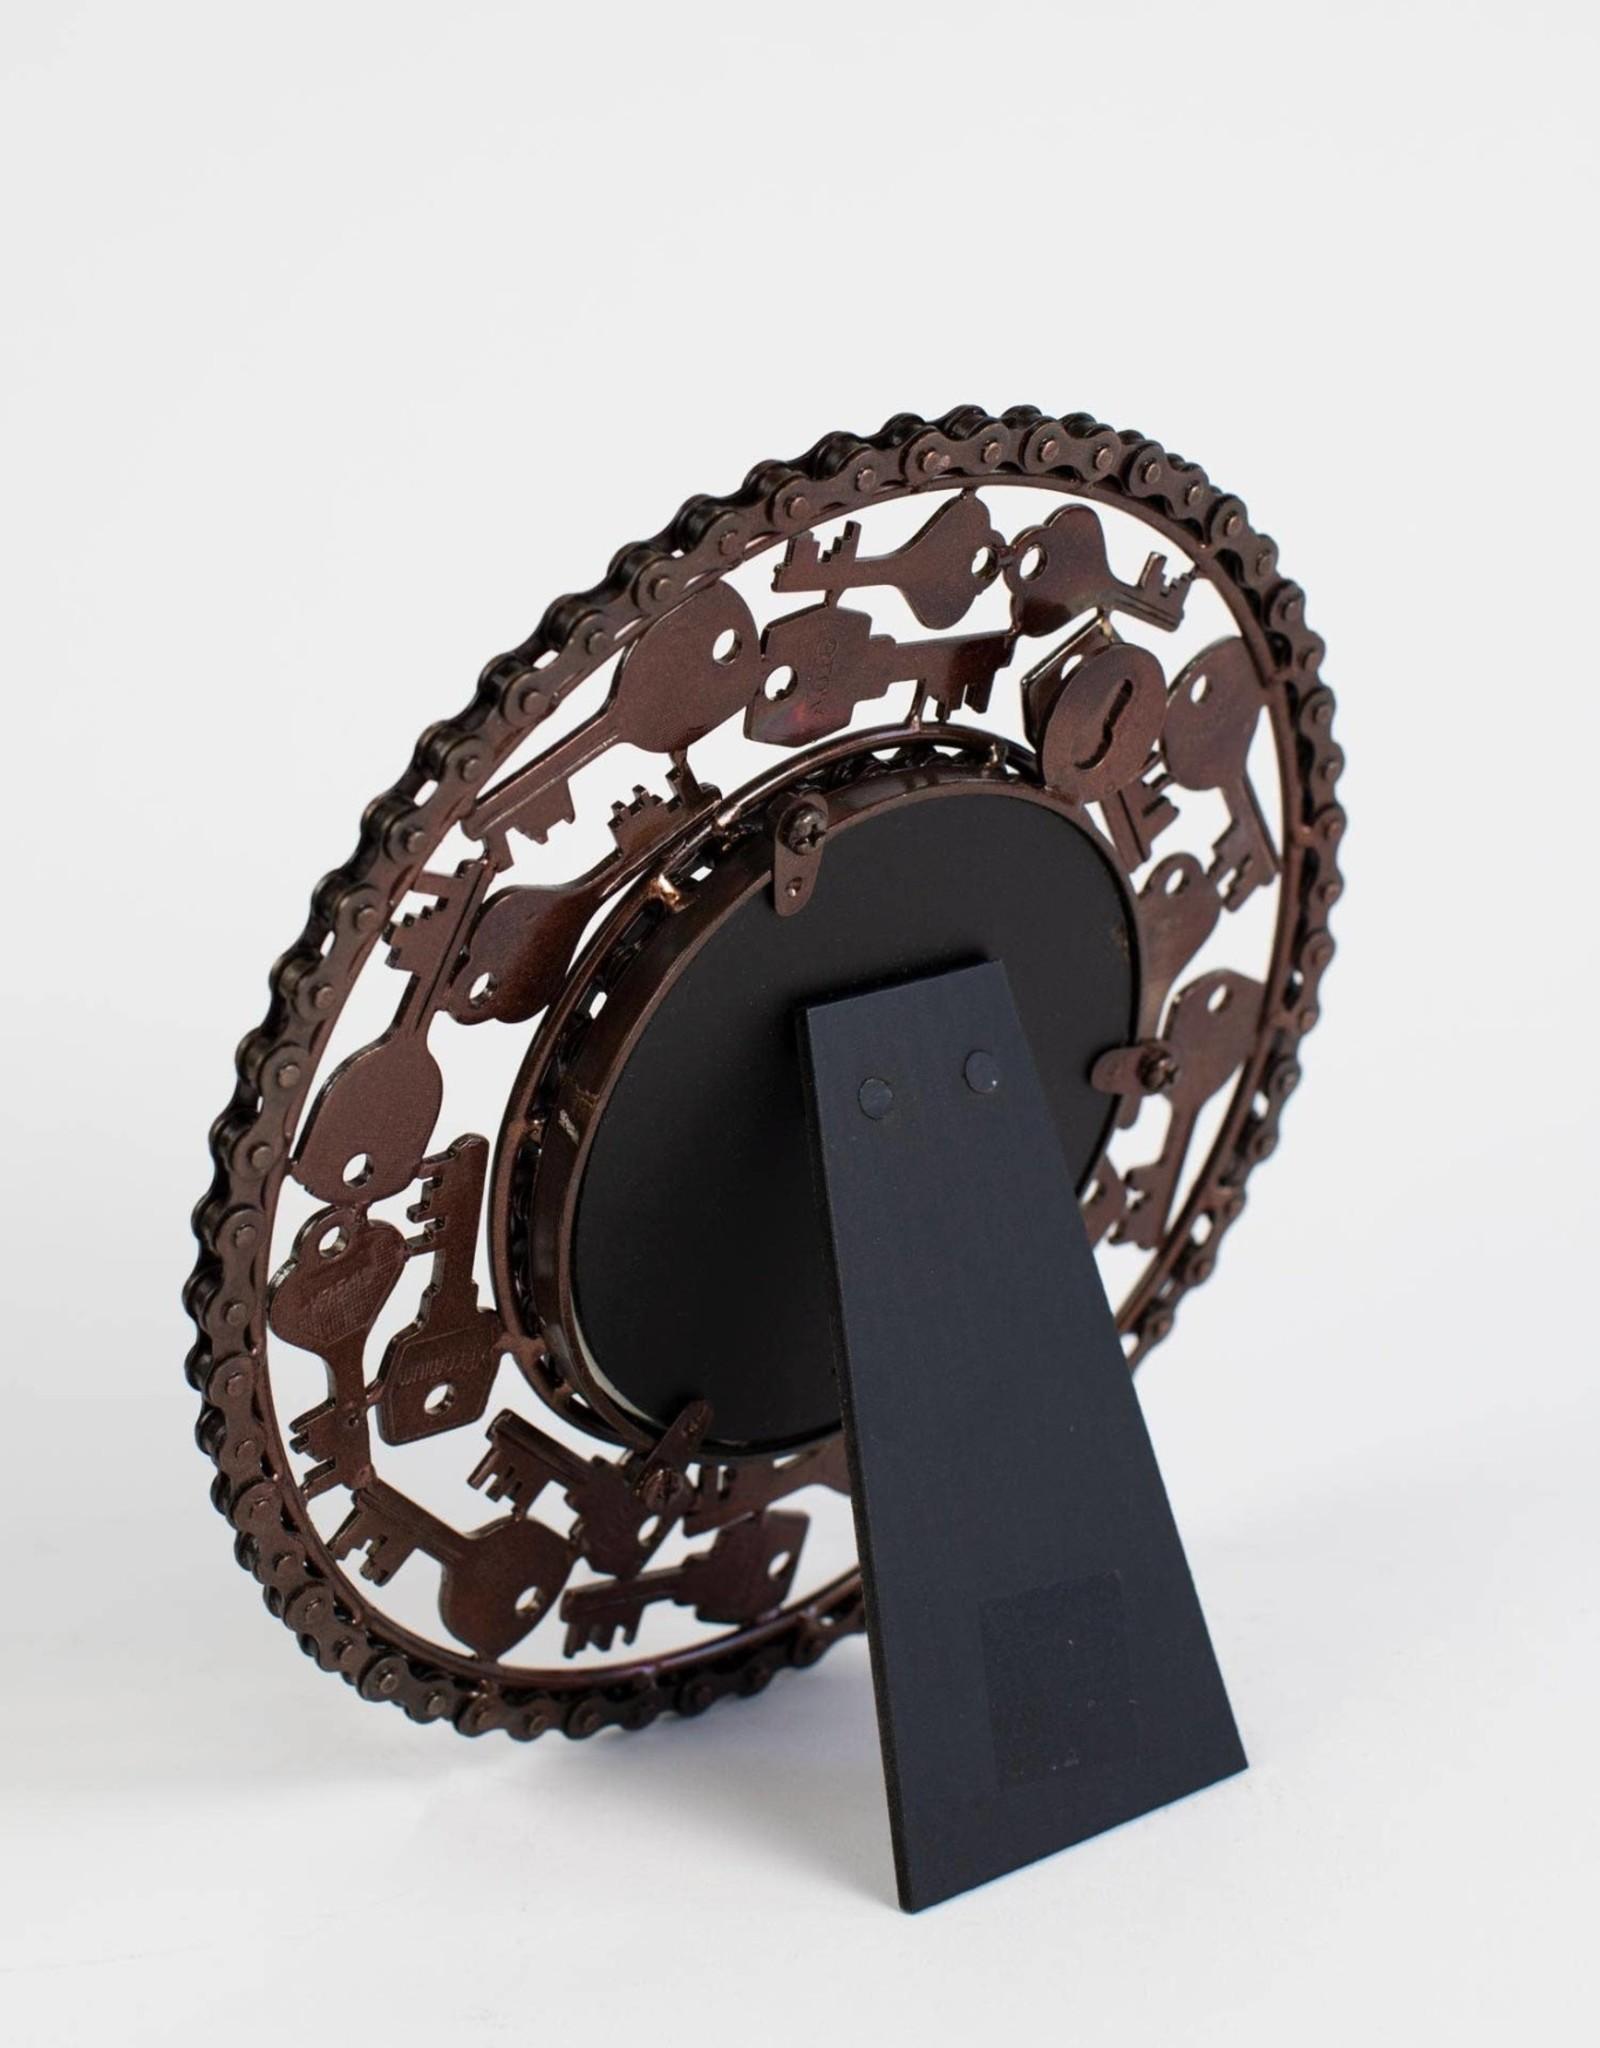 TTV USA Key & Bike Chain Frame